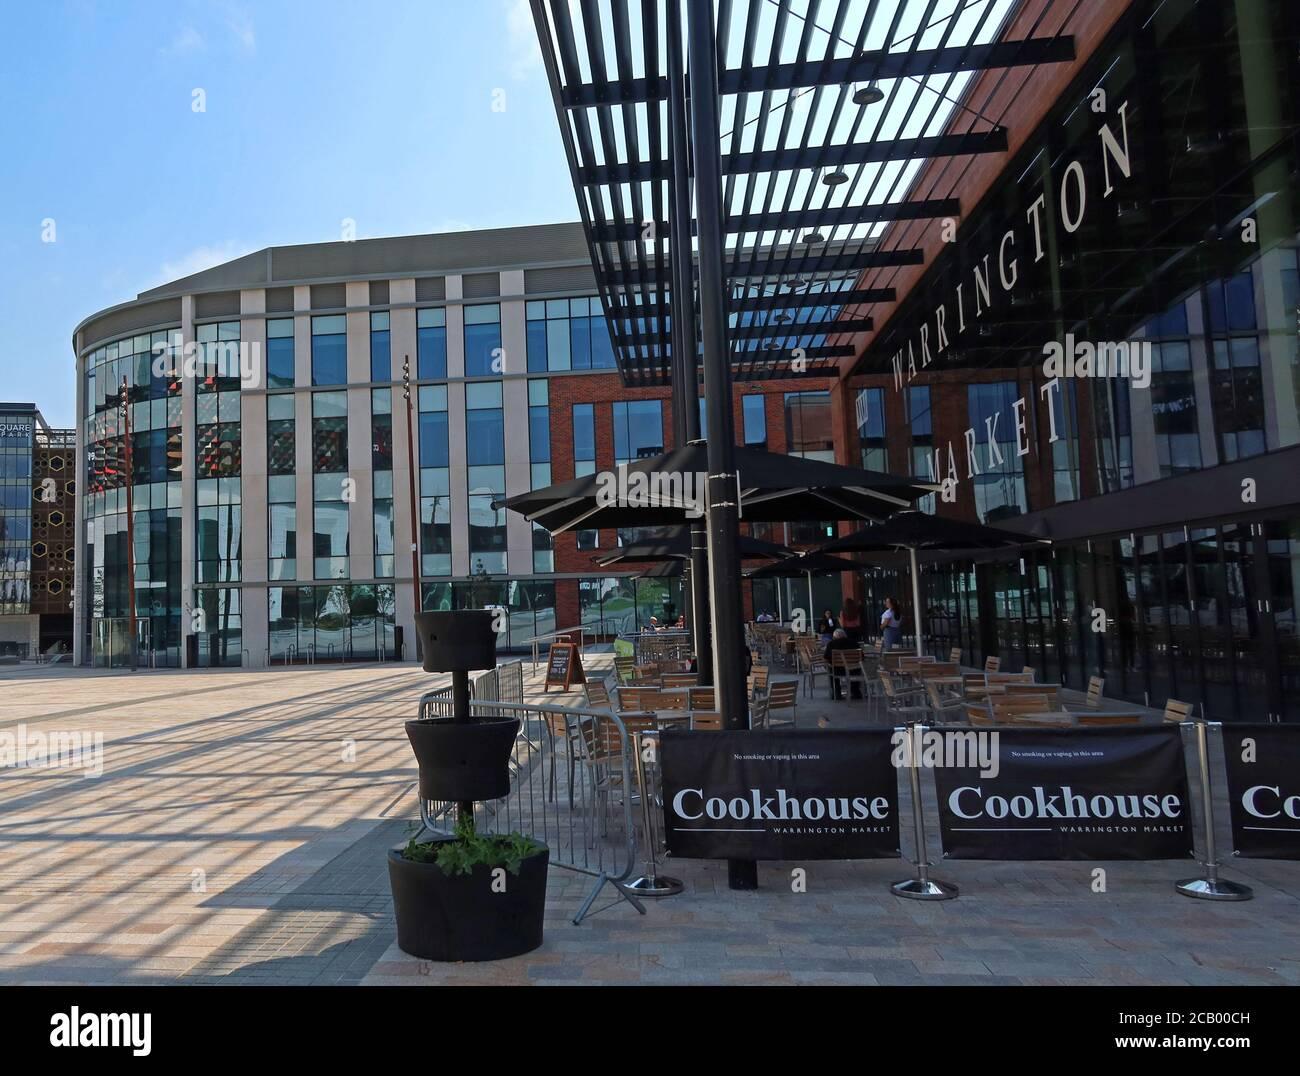 HotpixUK,@HotpixUK,GoTonySmith,Warrington,Cheshire,England,UK,retail,new retail development,VINCI Construction,pedestrianised,place,Warrington Market,building,square,outdoor,outdoors,shaded,area